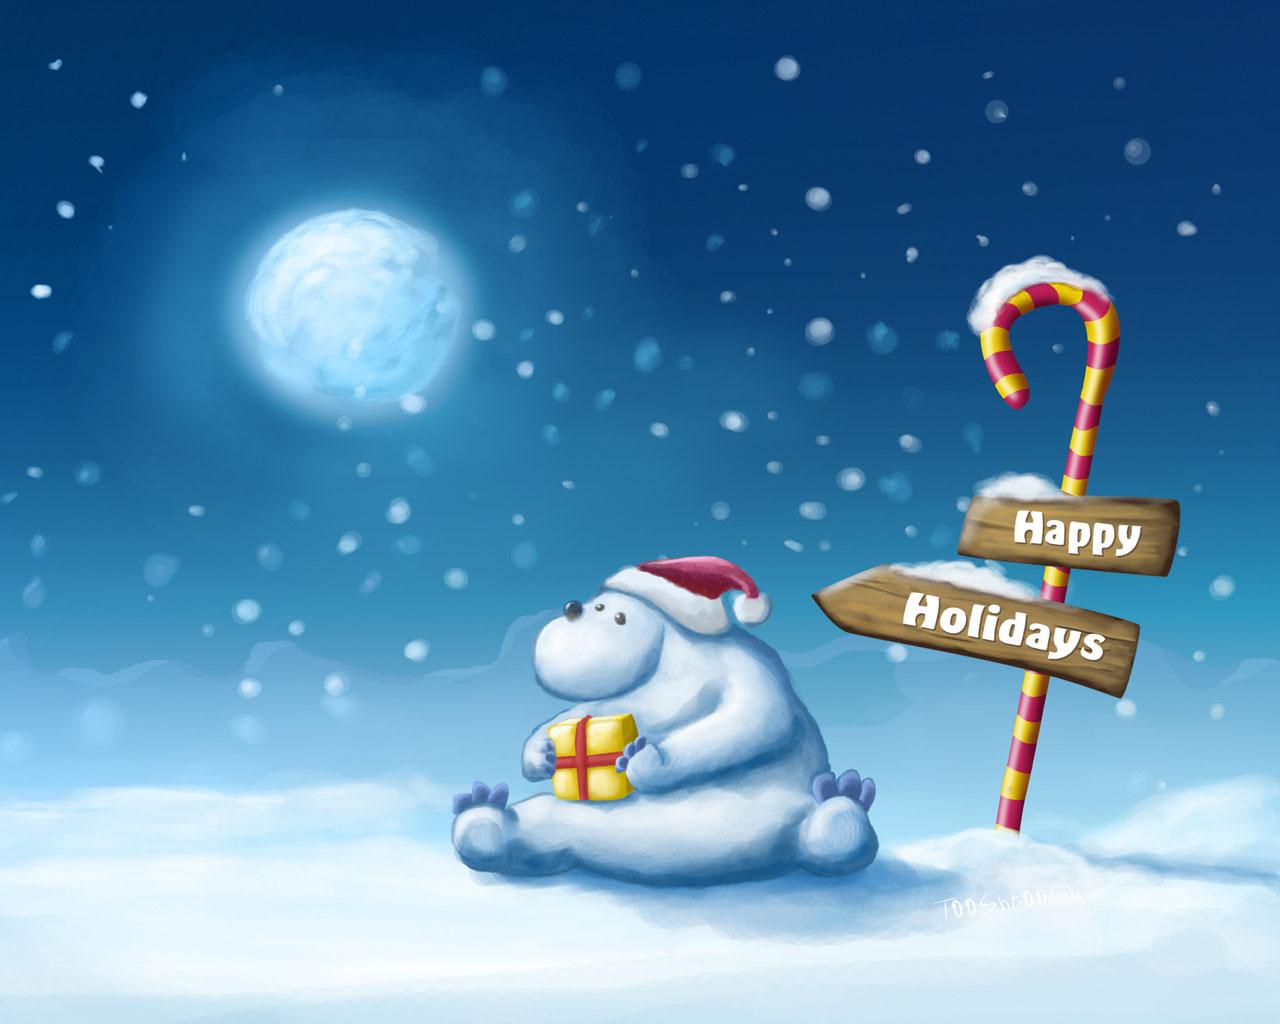 12801024 Christmas Illustration   Christmas Graphic Design Wallpaper 1280x1024